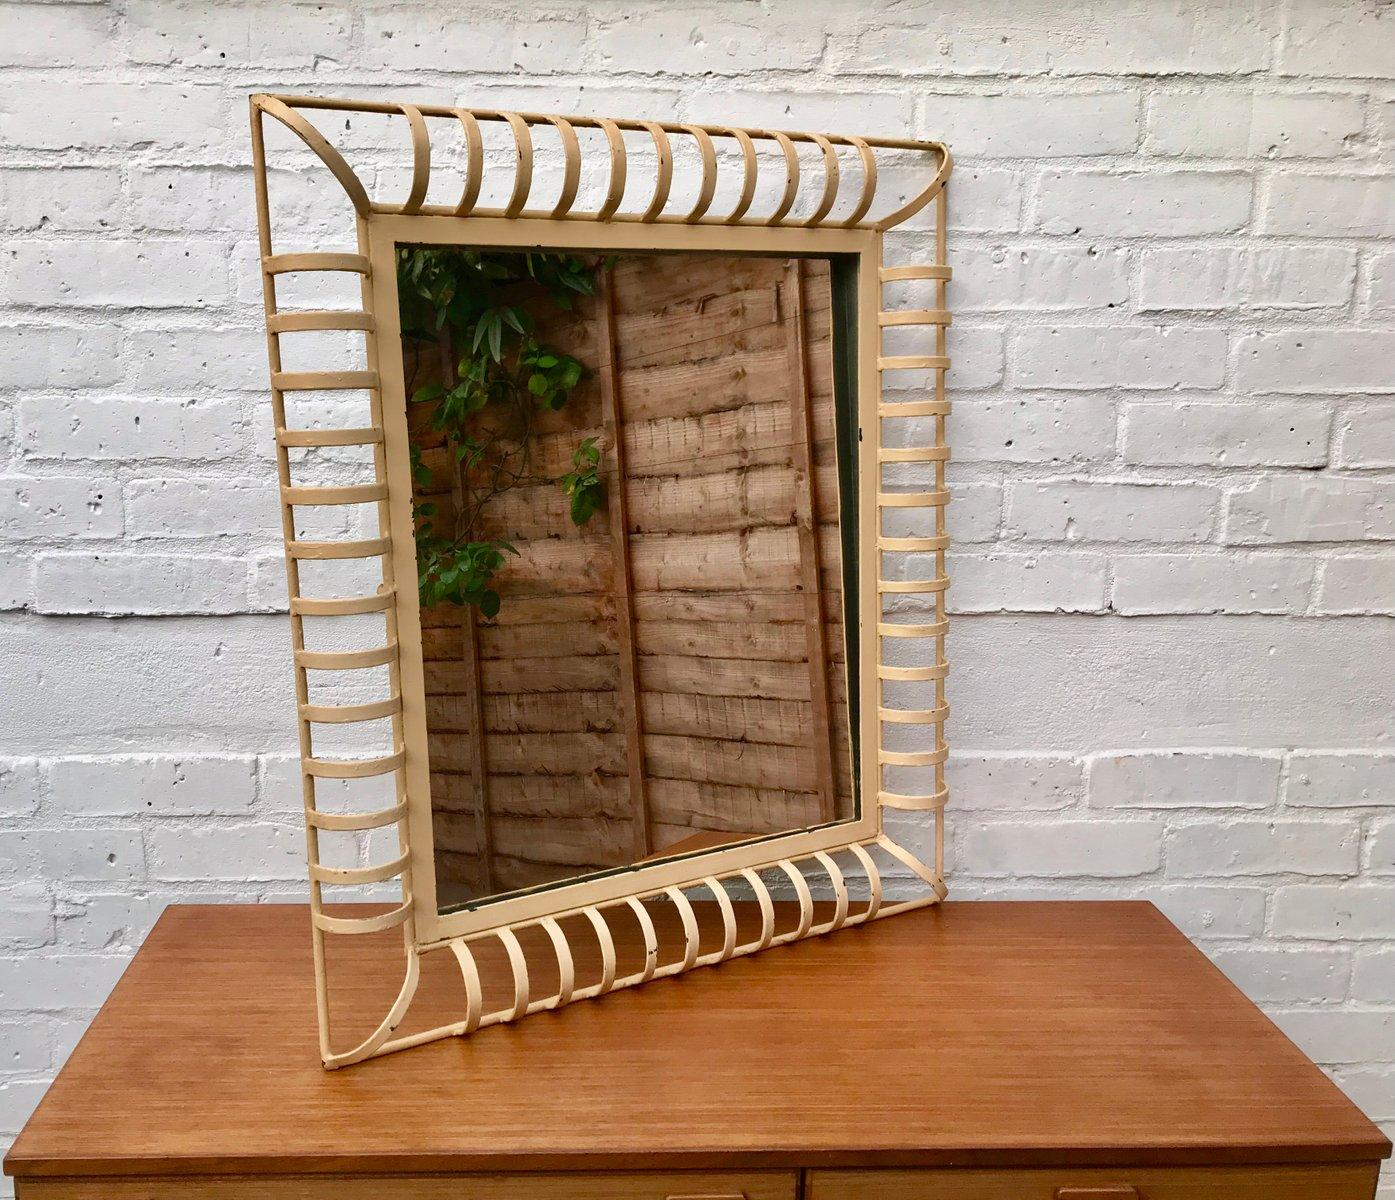 miroir mural industriel rectangulaire vintage en m tal en. Black Bedroom Furniture Sets. Home Design Ideas